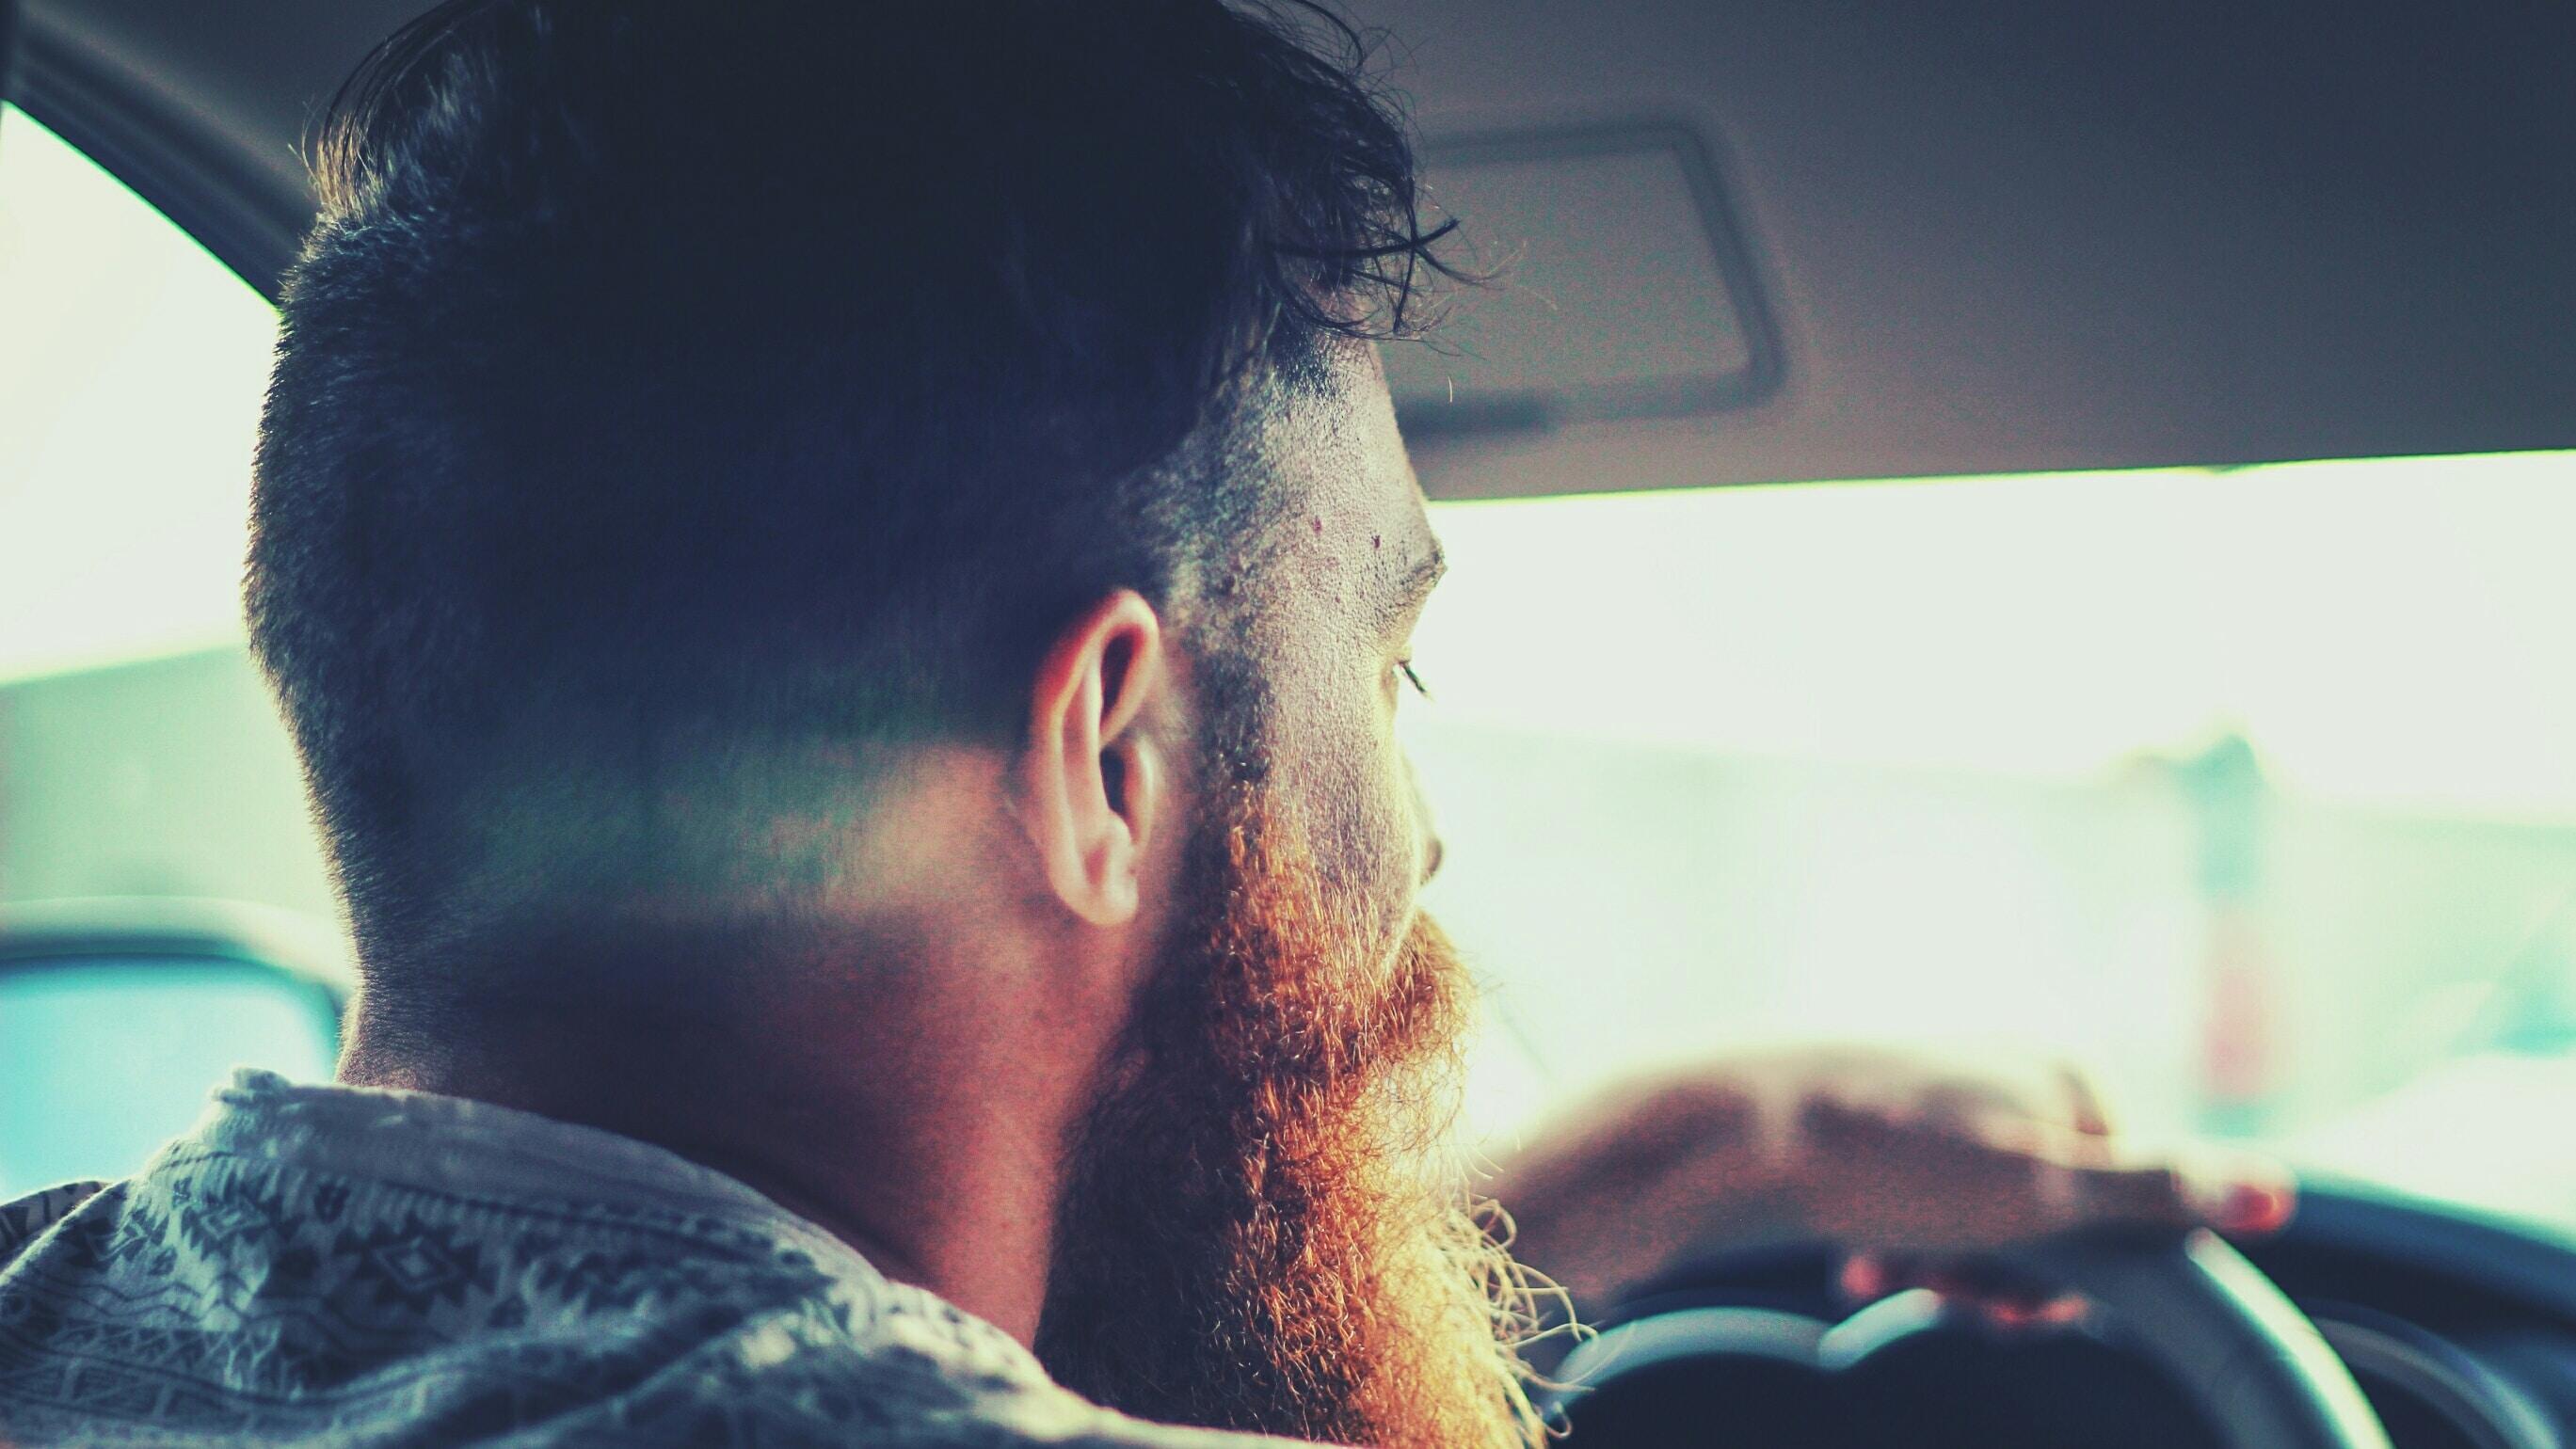 close up photography of man inside car